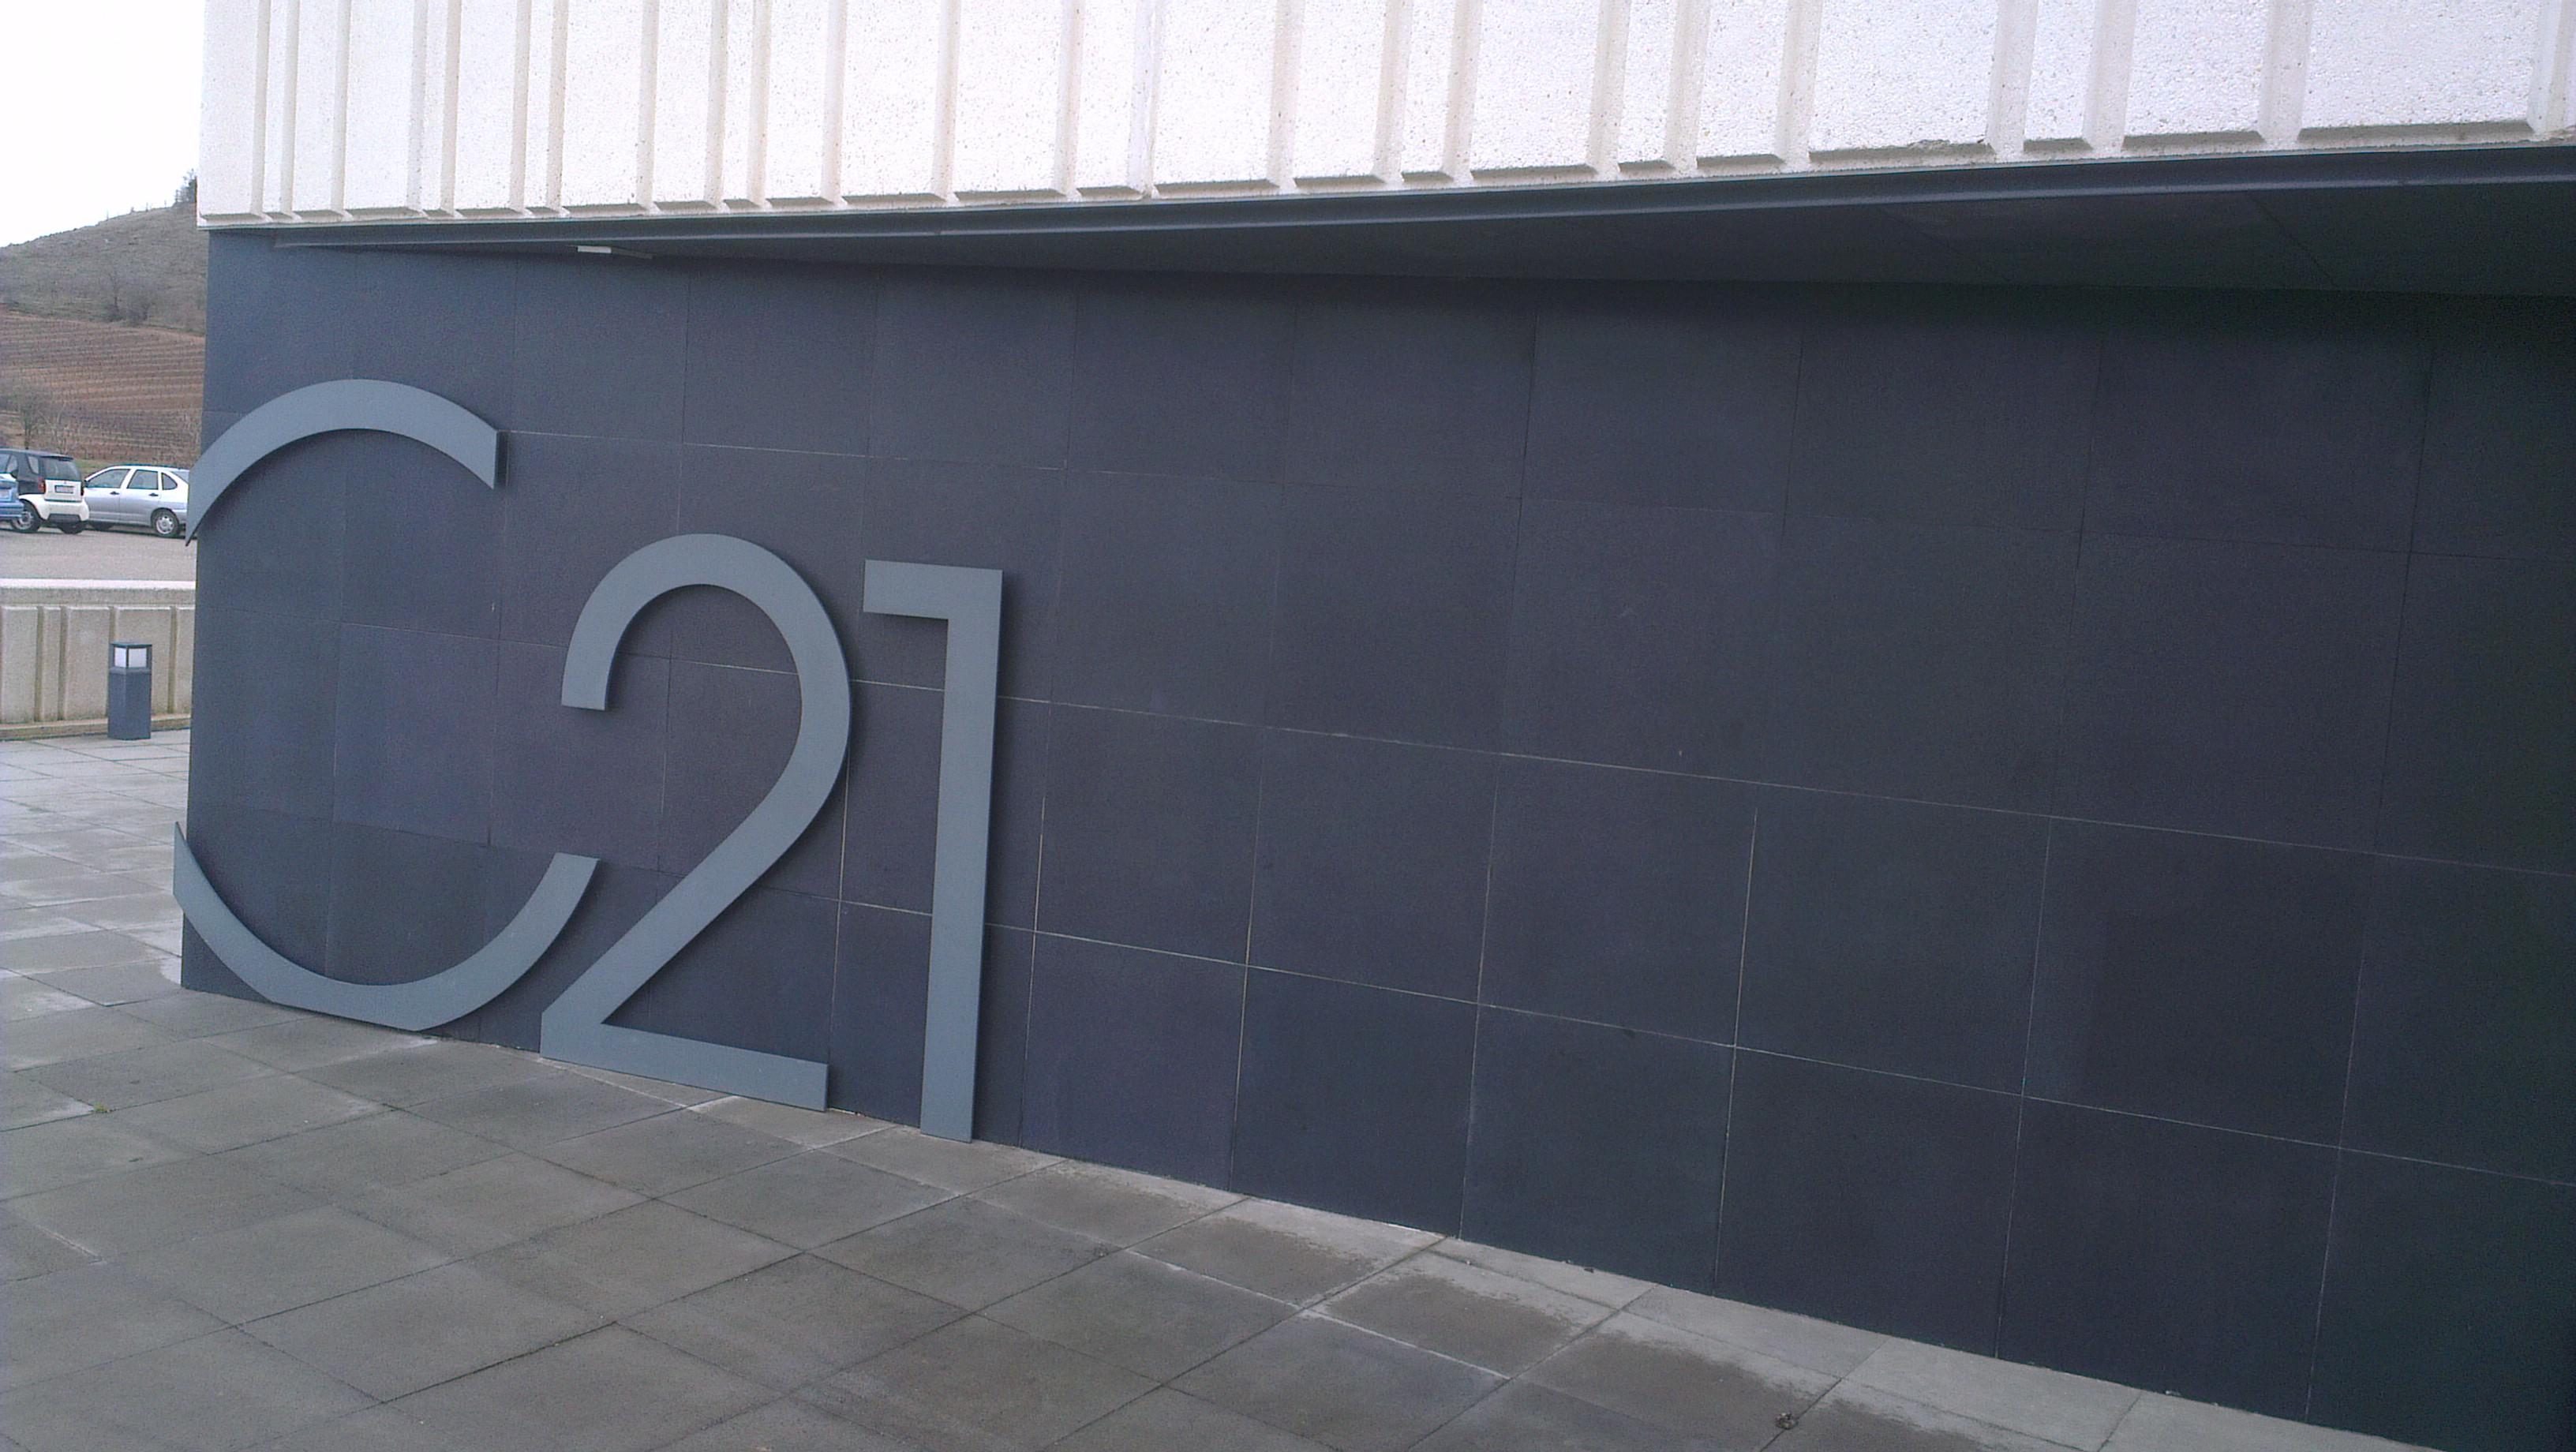 Restaurante Cepa 21 Que gozada!!!